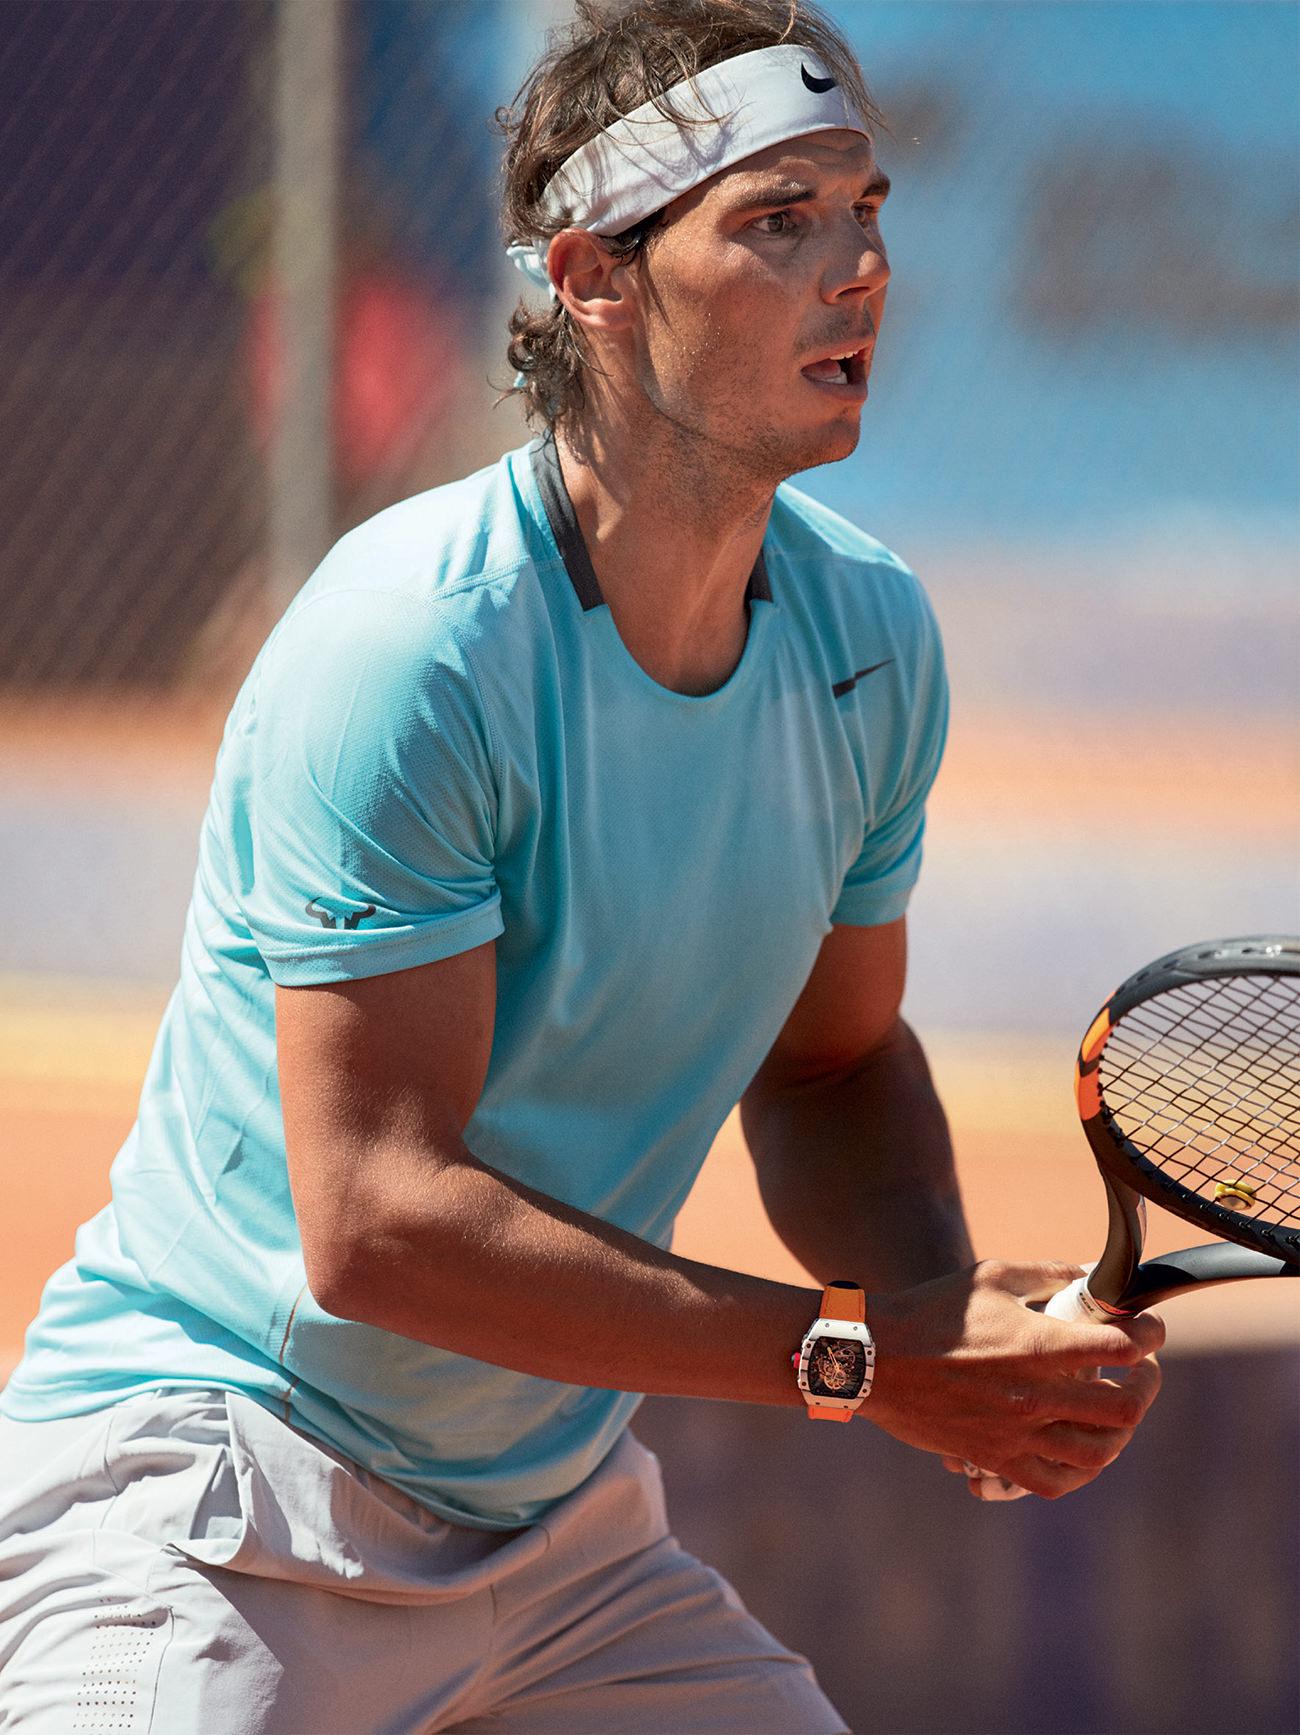 The Tourbillon RM 27 02 Rafael Nadal By Richard Mille